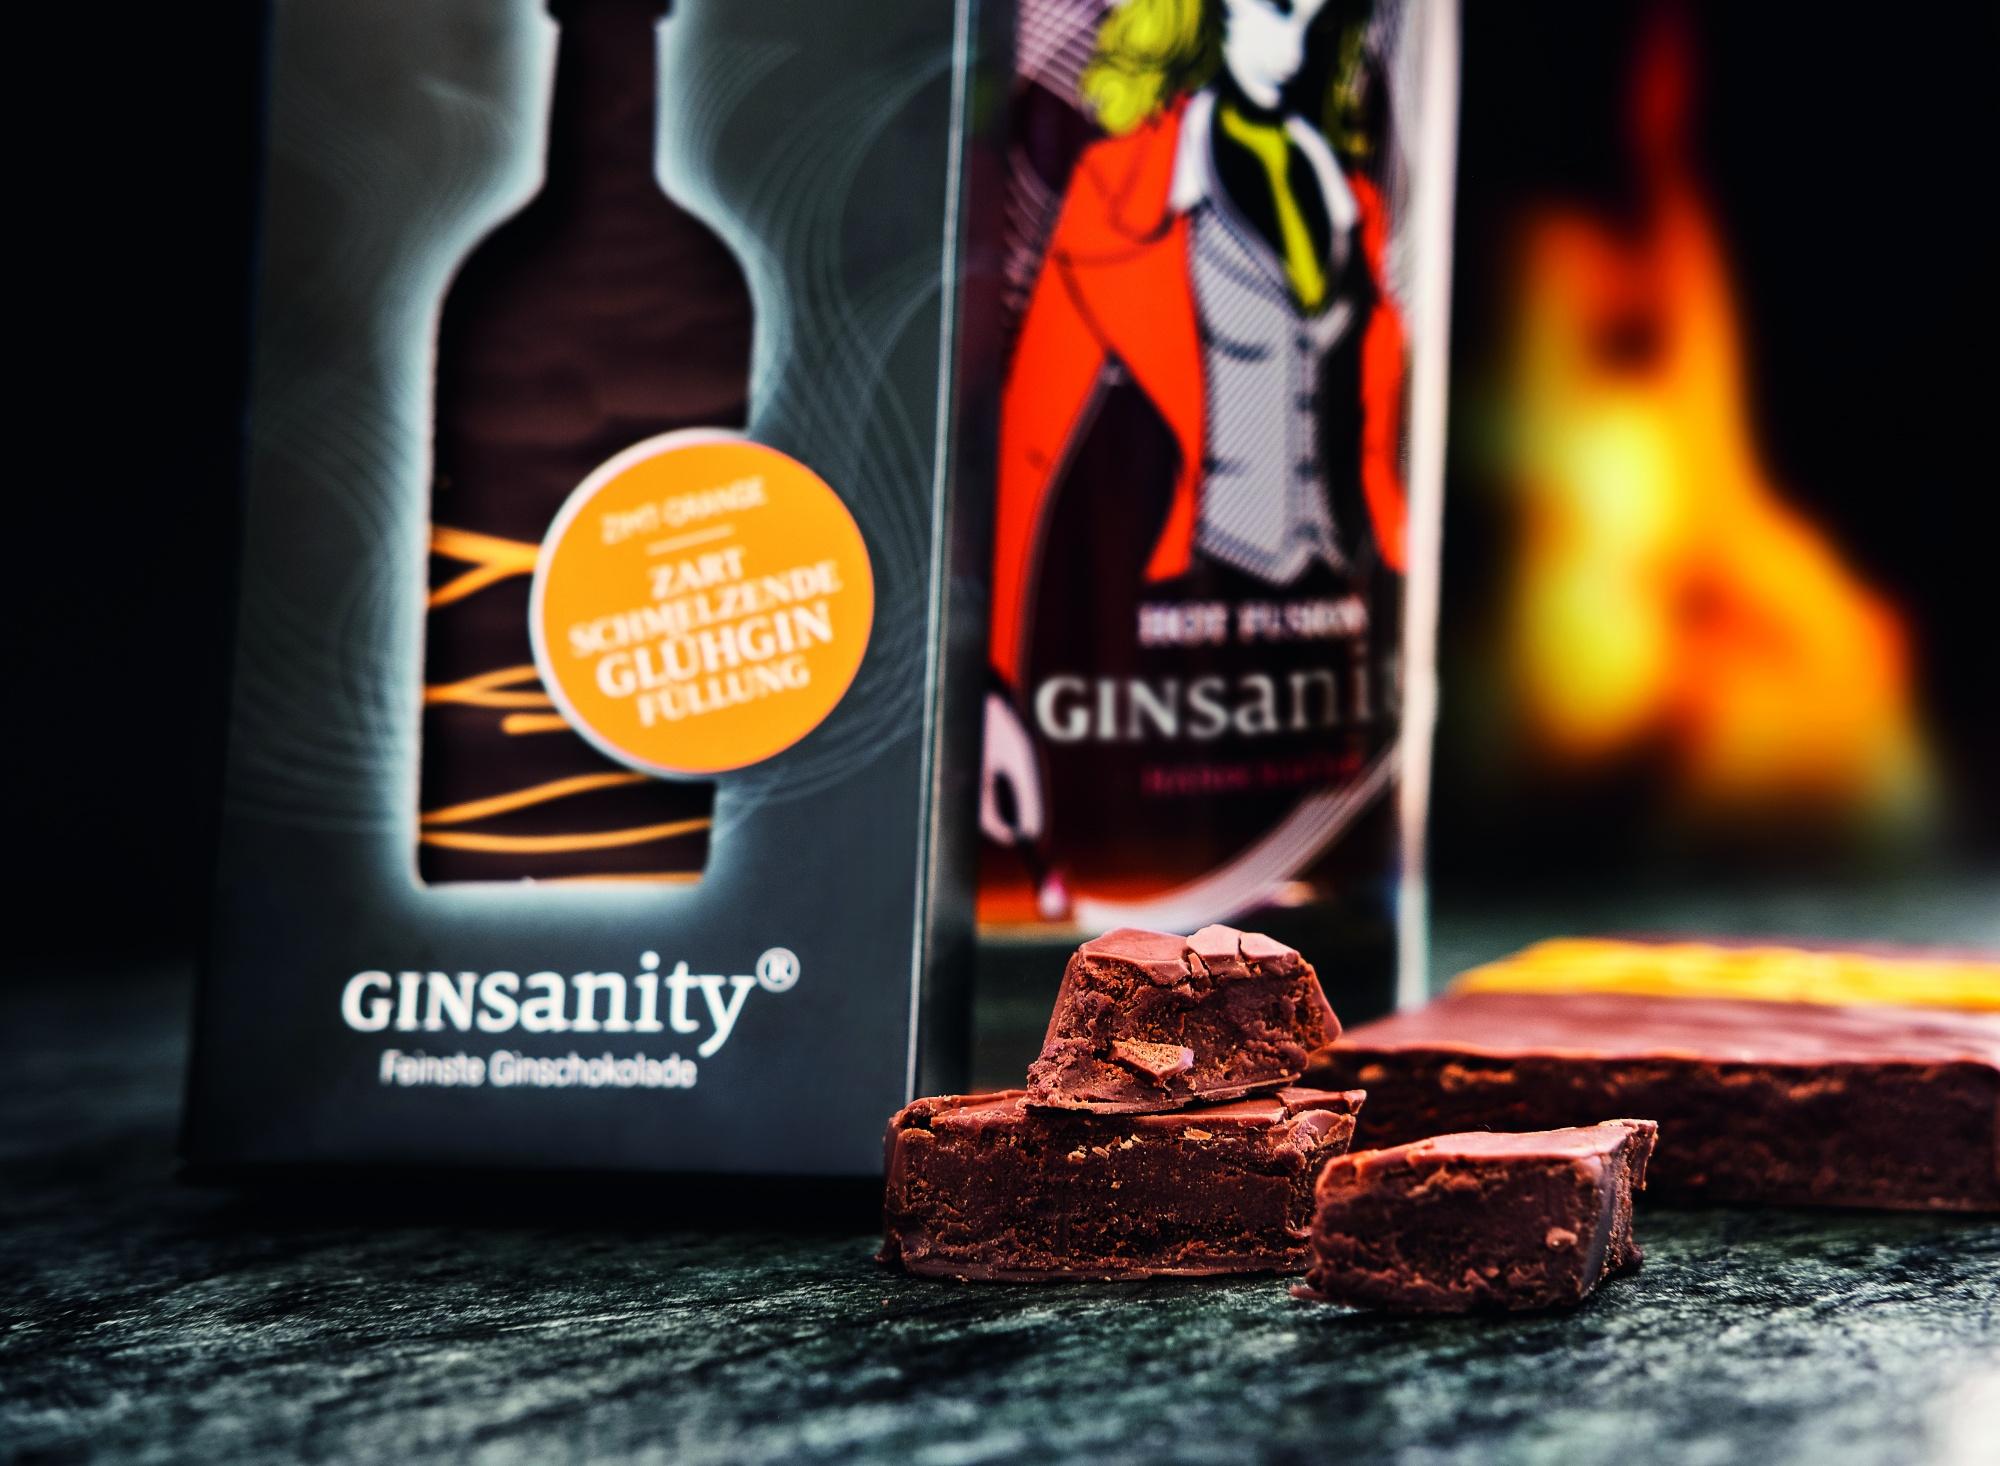 Ginsanity